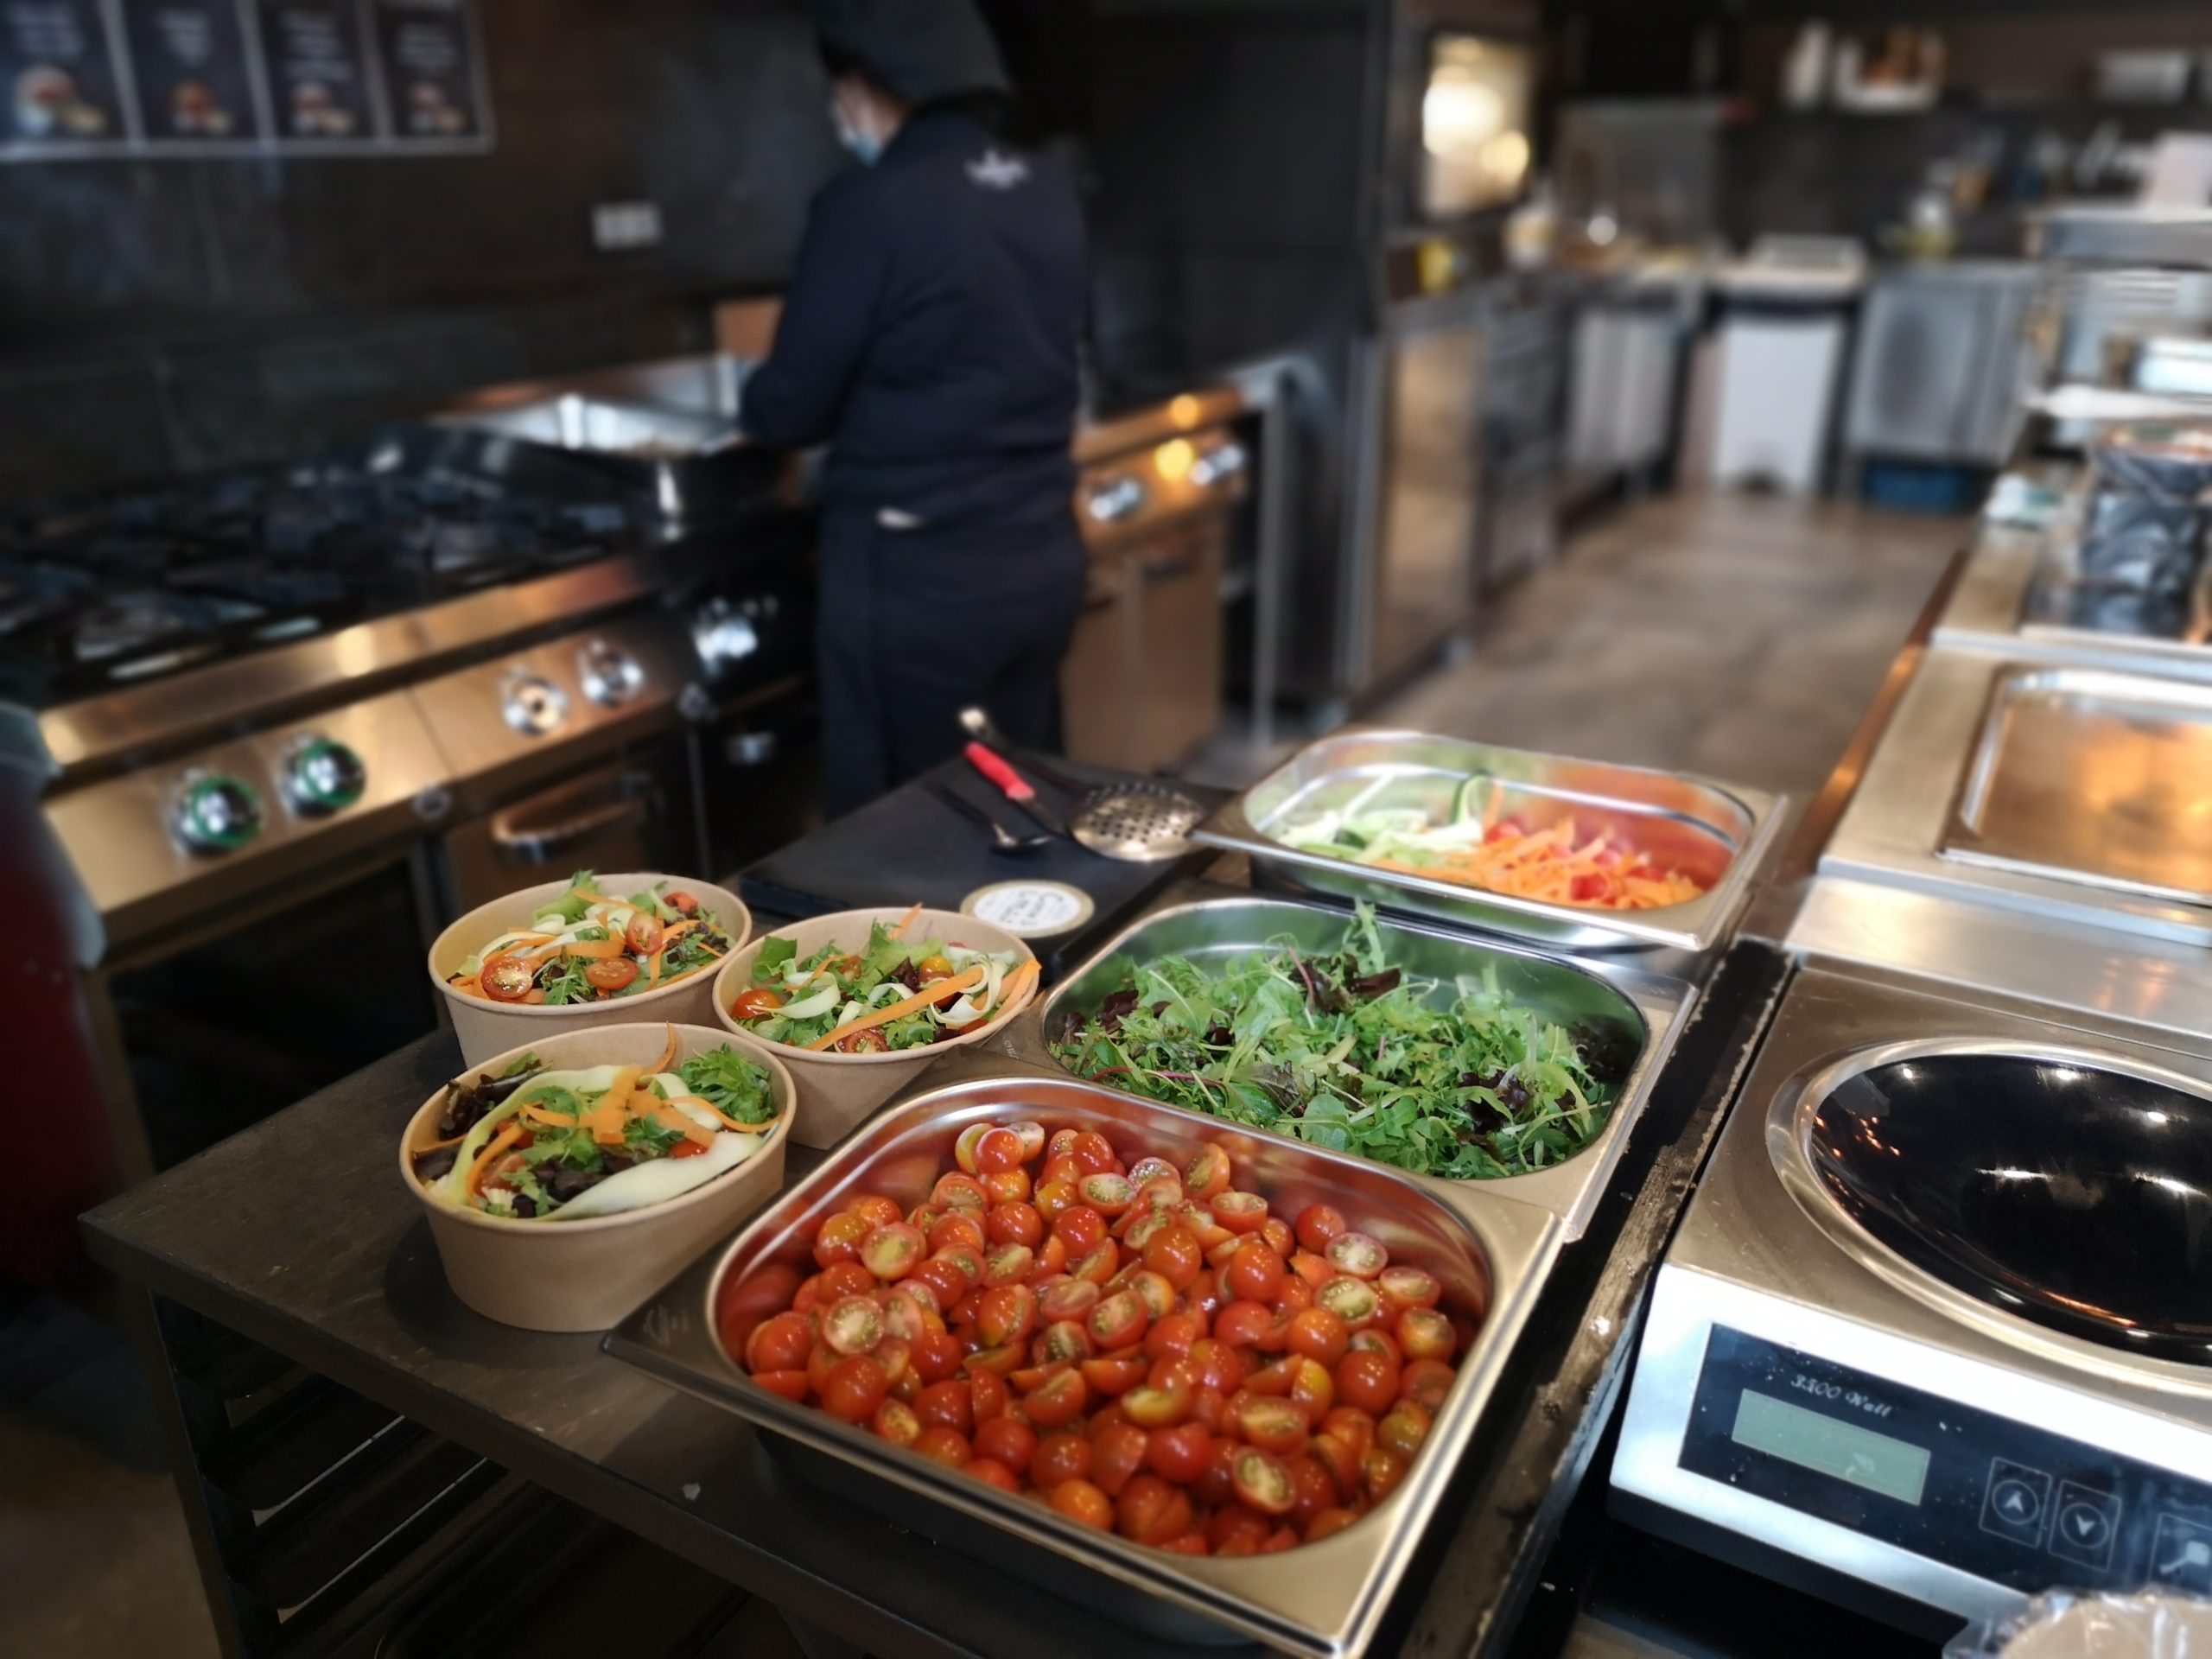 La Focacceria Restaurant Traiteur Delivery take Away Luxembourg Come a la Maison 14